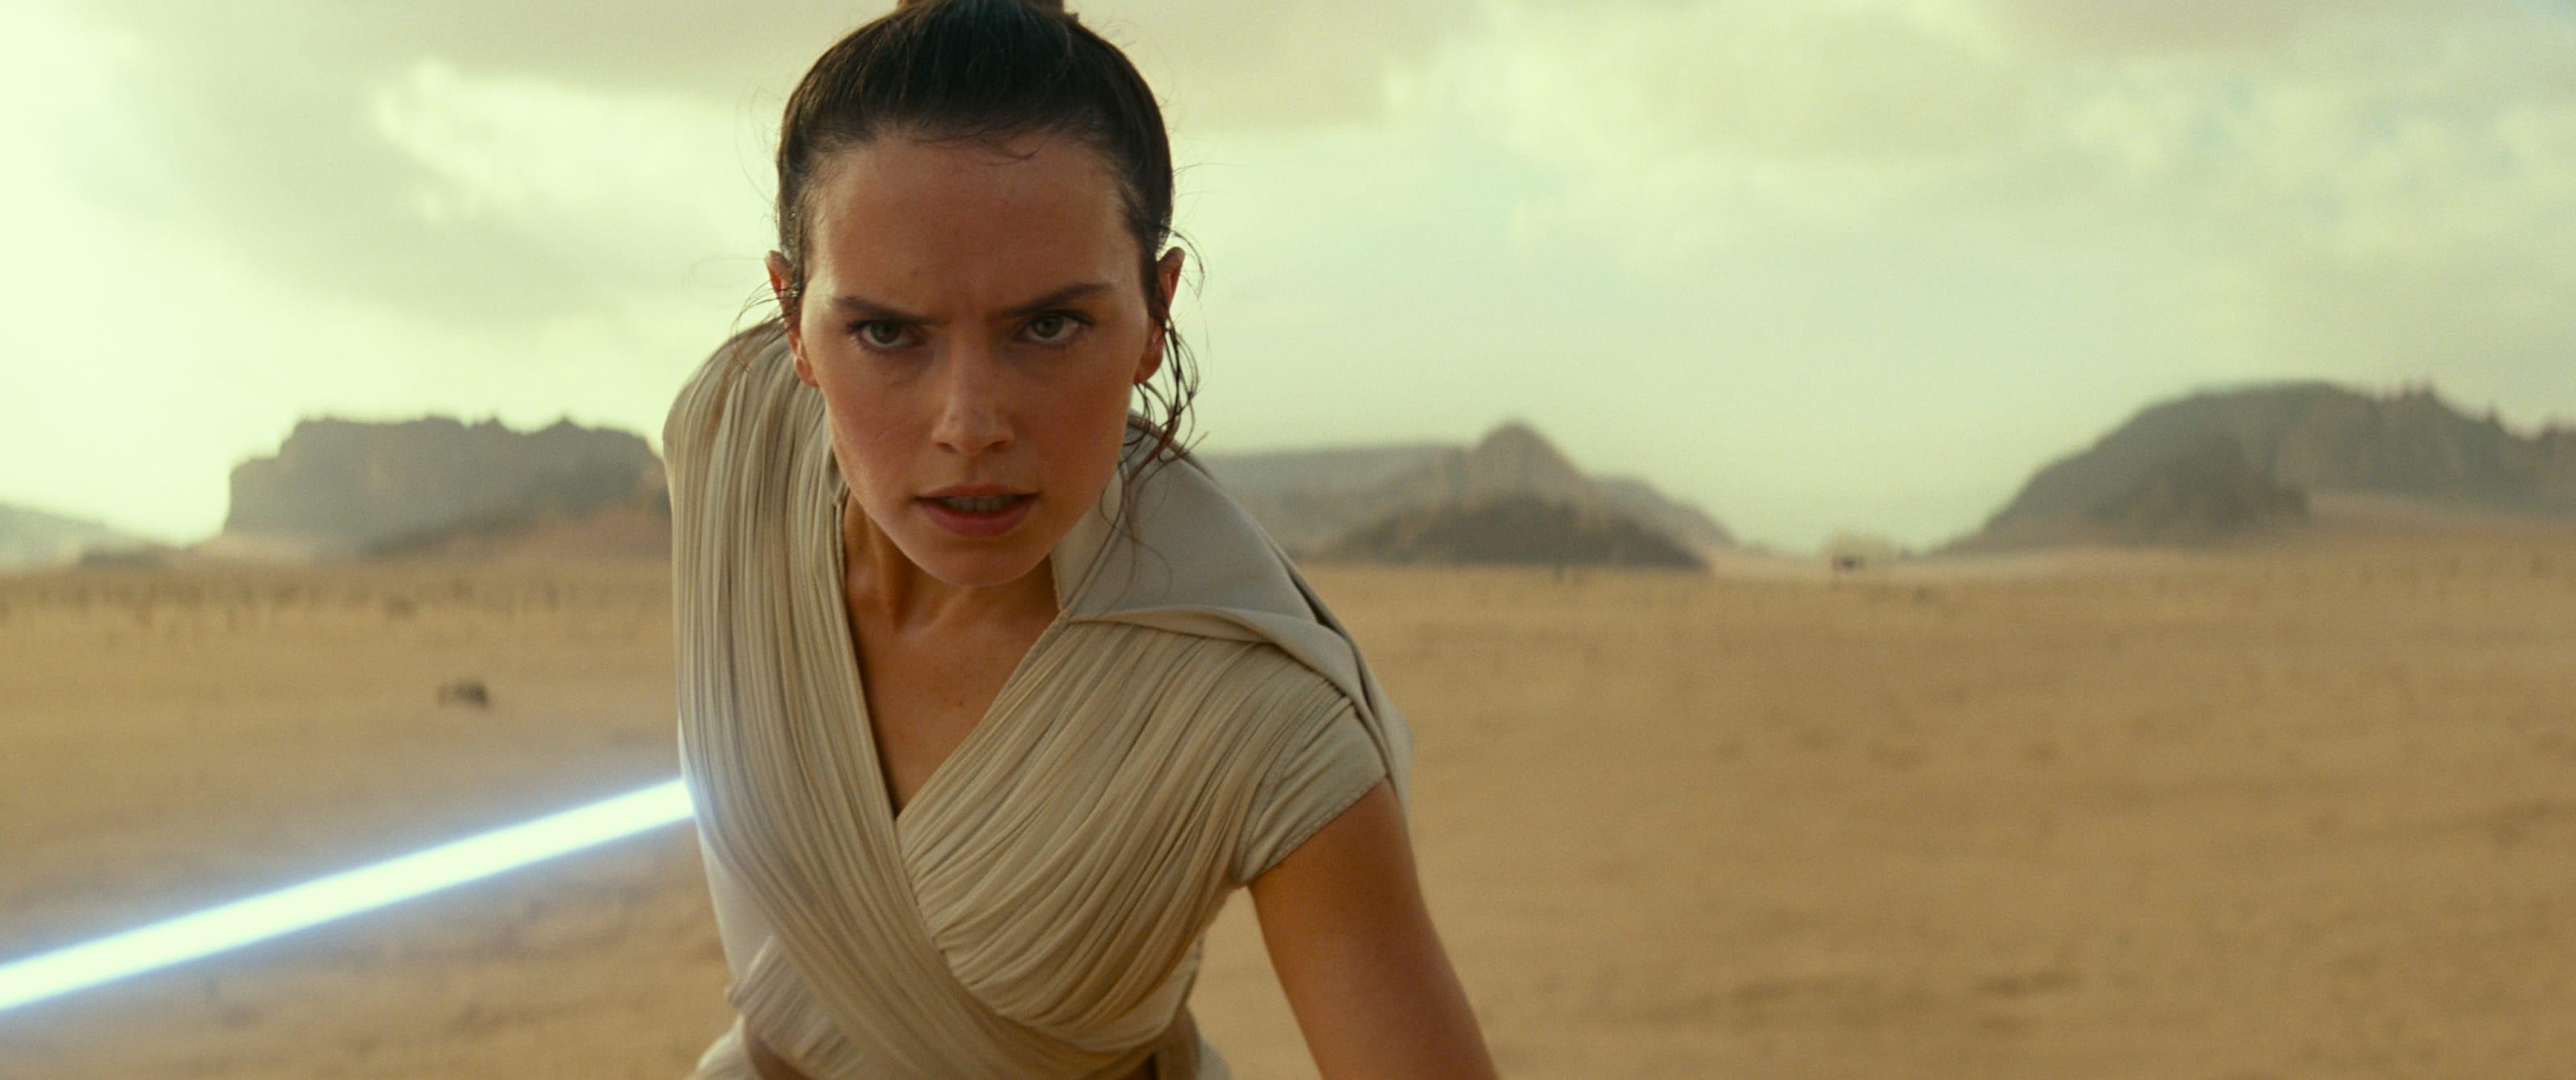 Star Wars: The Rise of Skywalker, Star Wars Episode IX, Star Wars: Episode IX